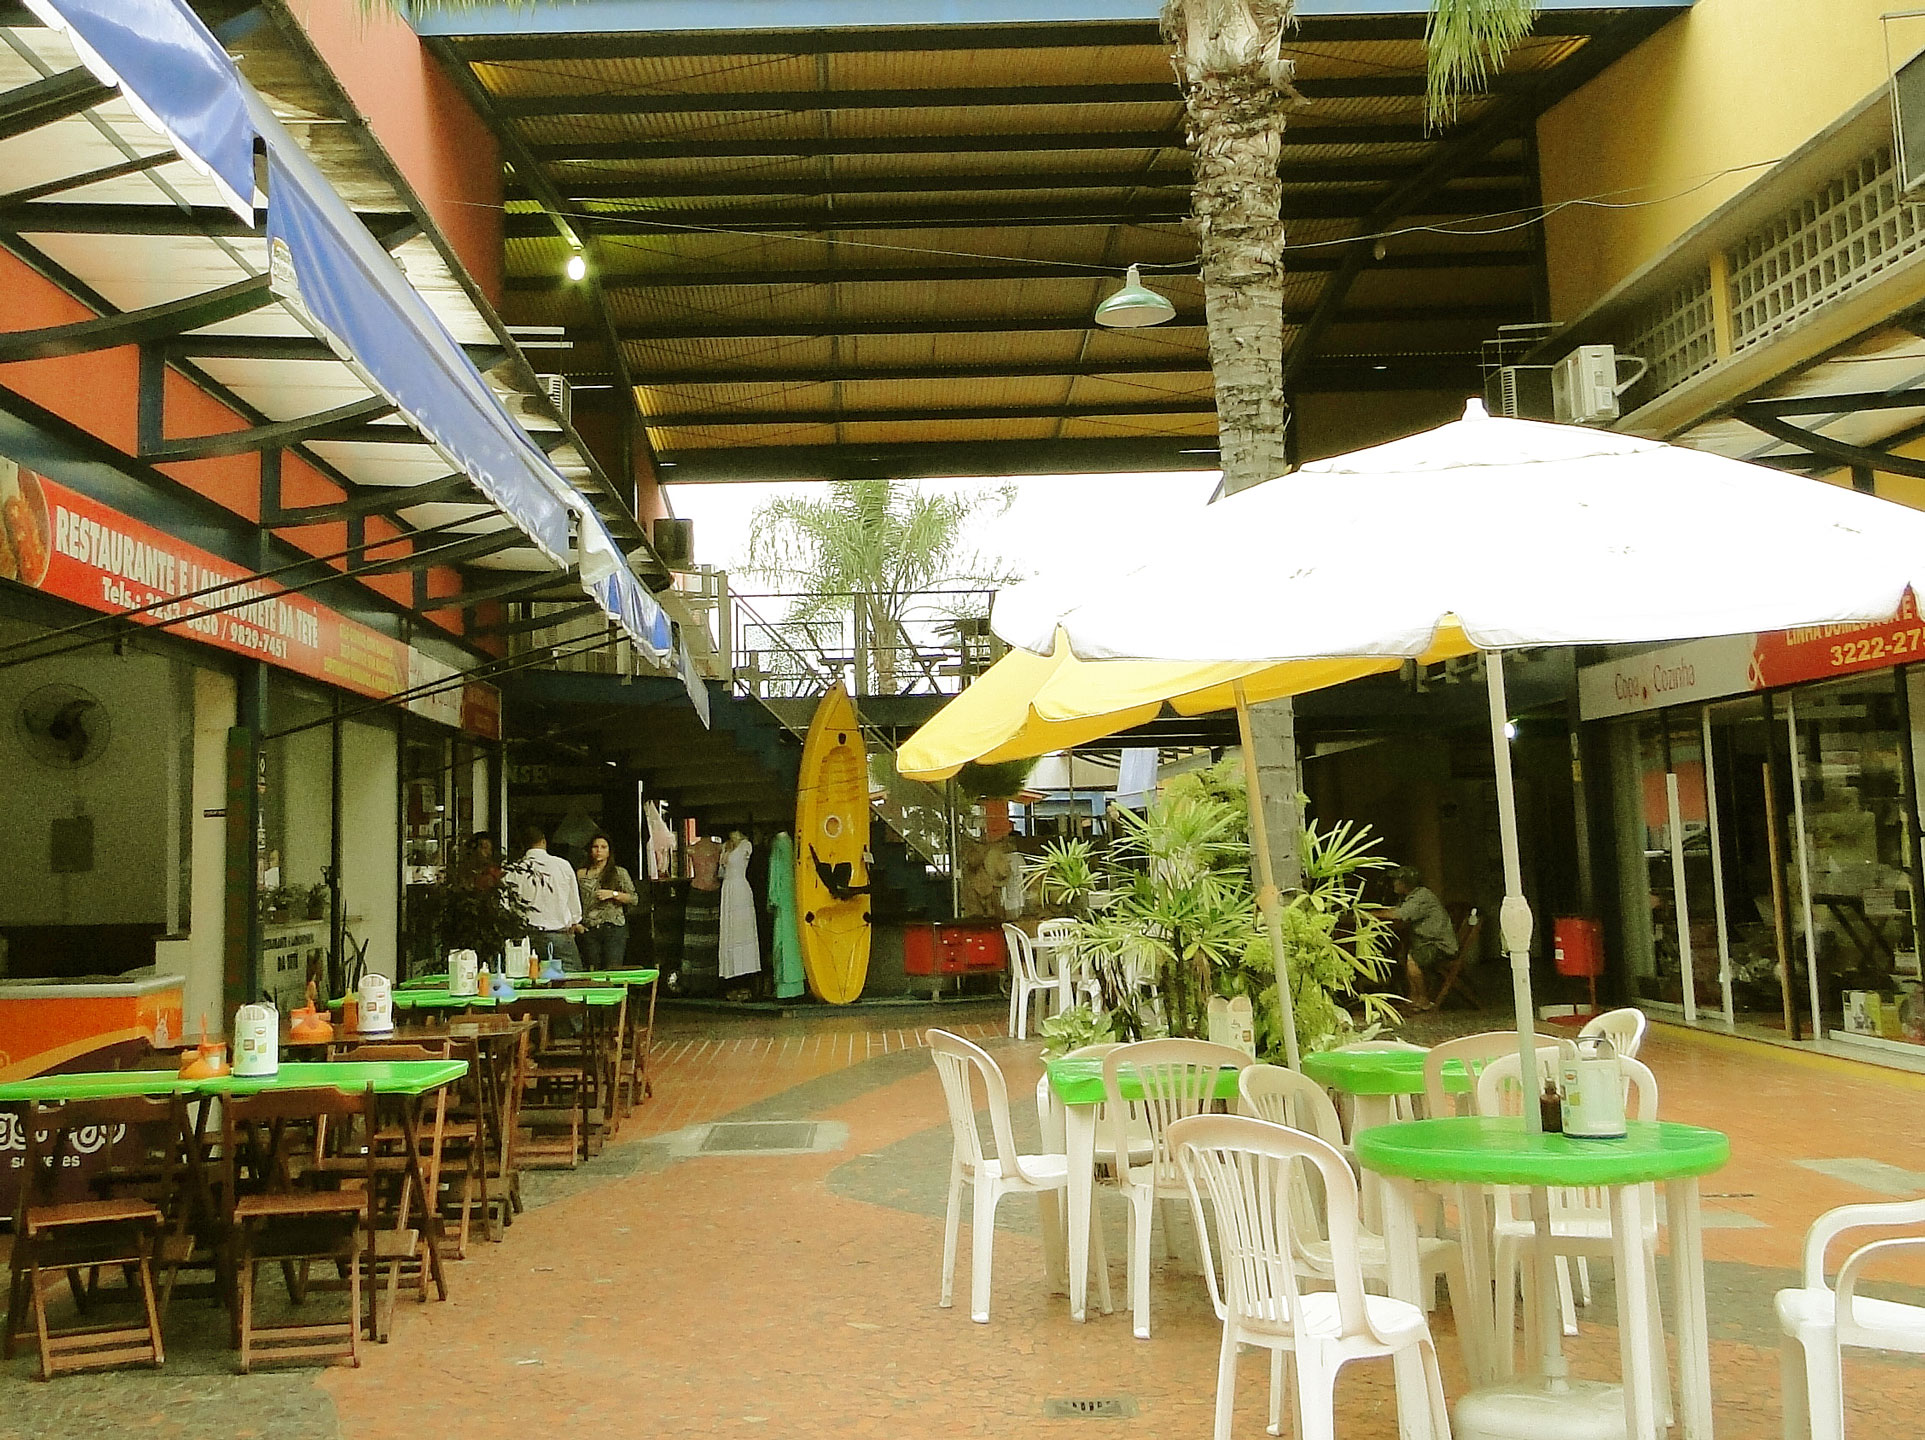 Mercado da Vila Rubim terá reformas